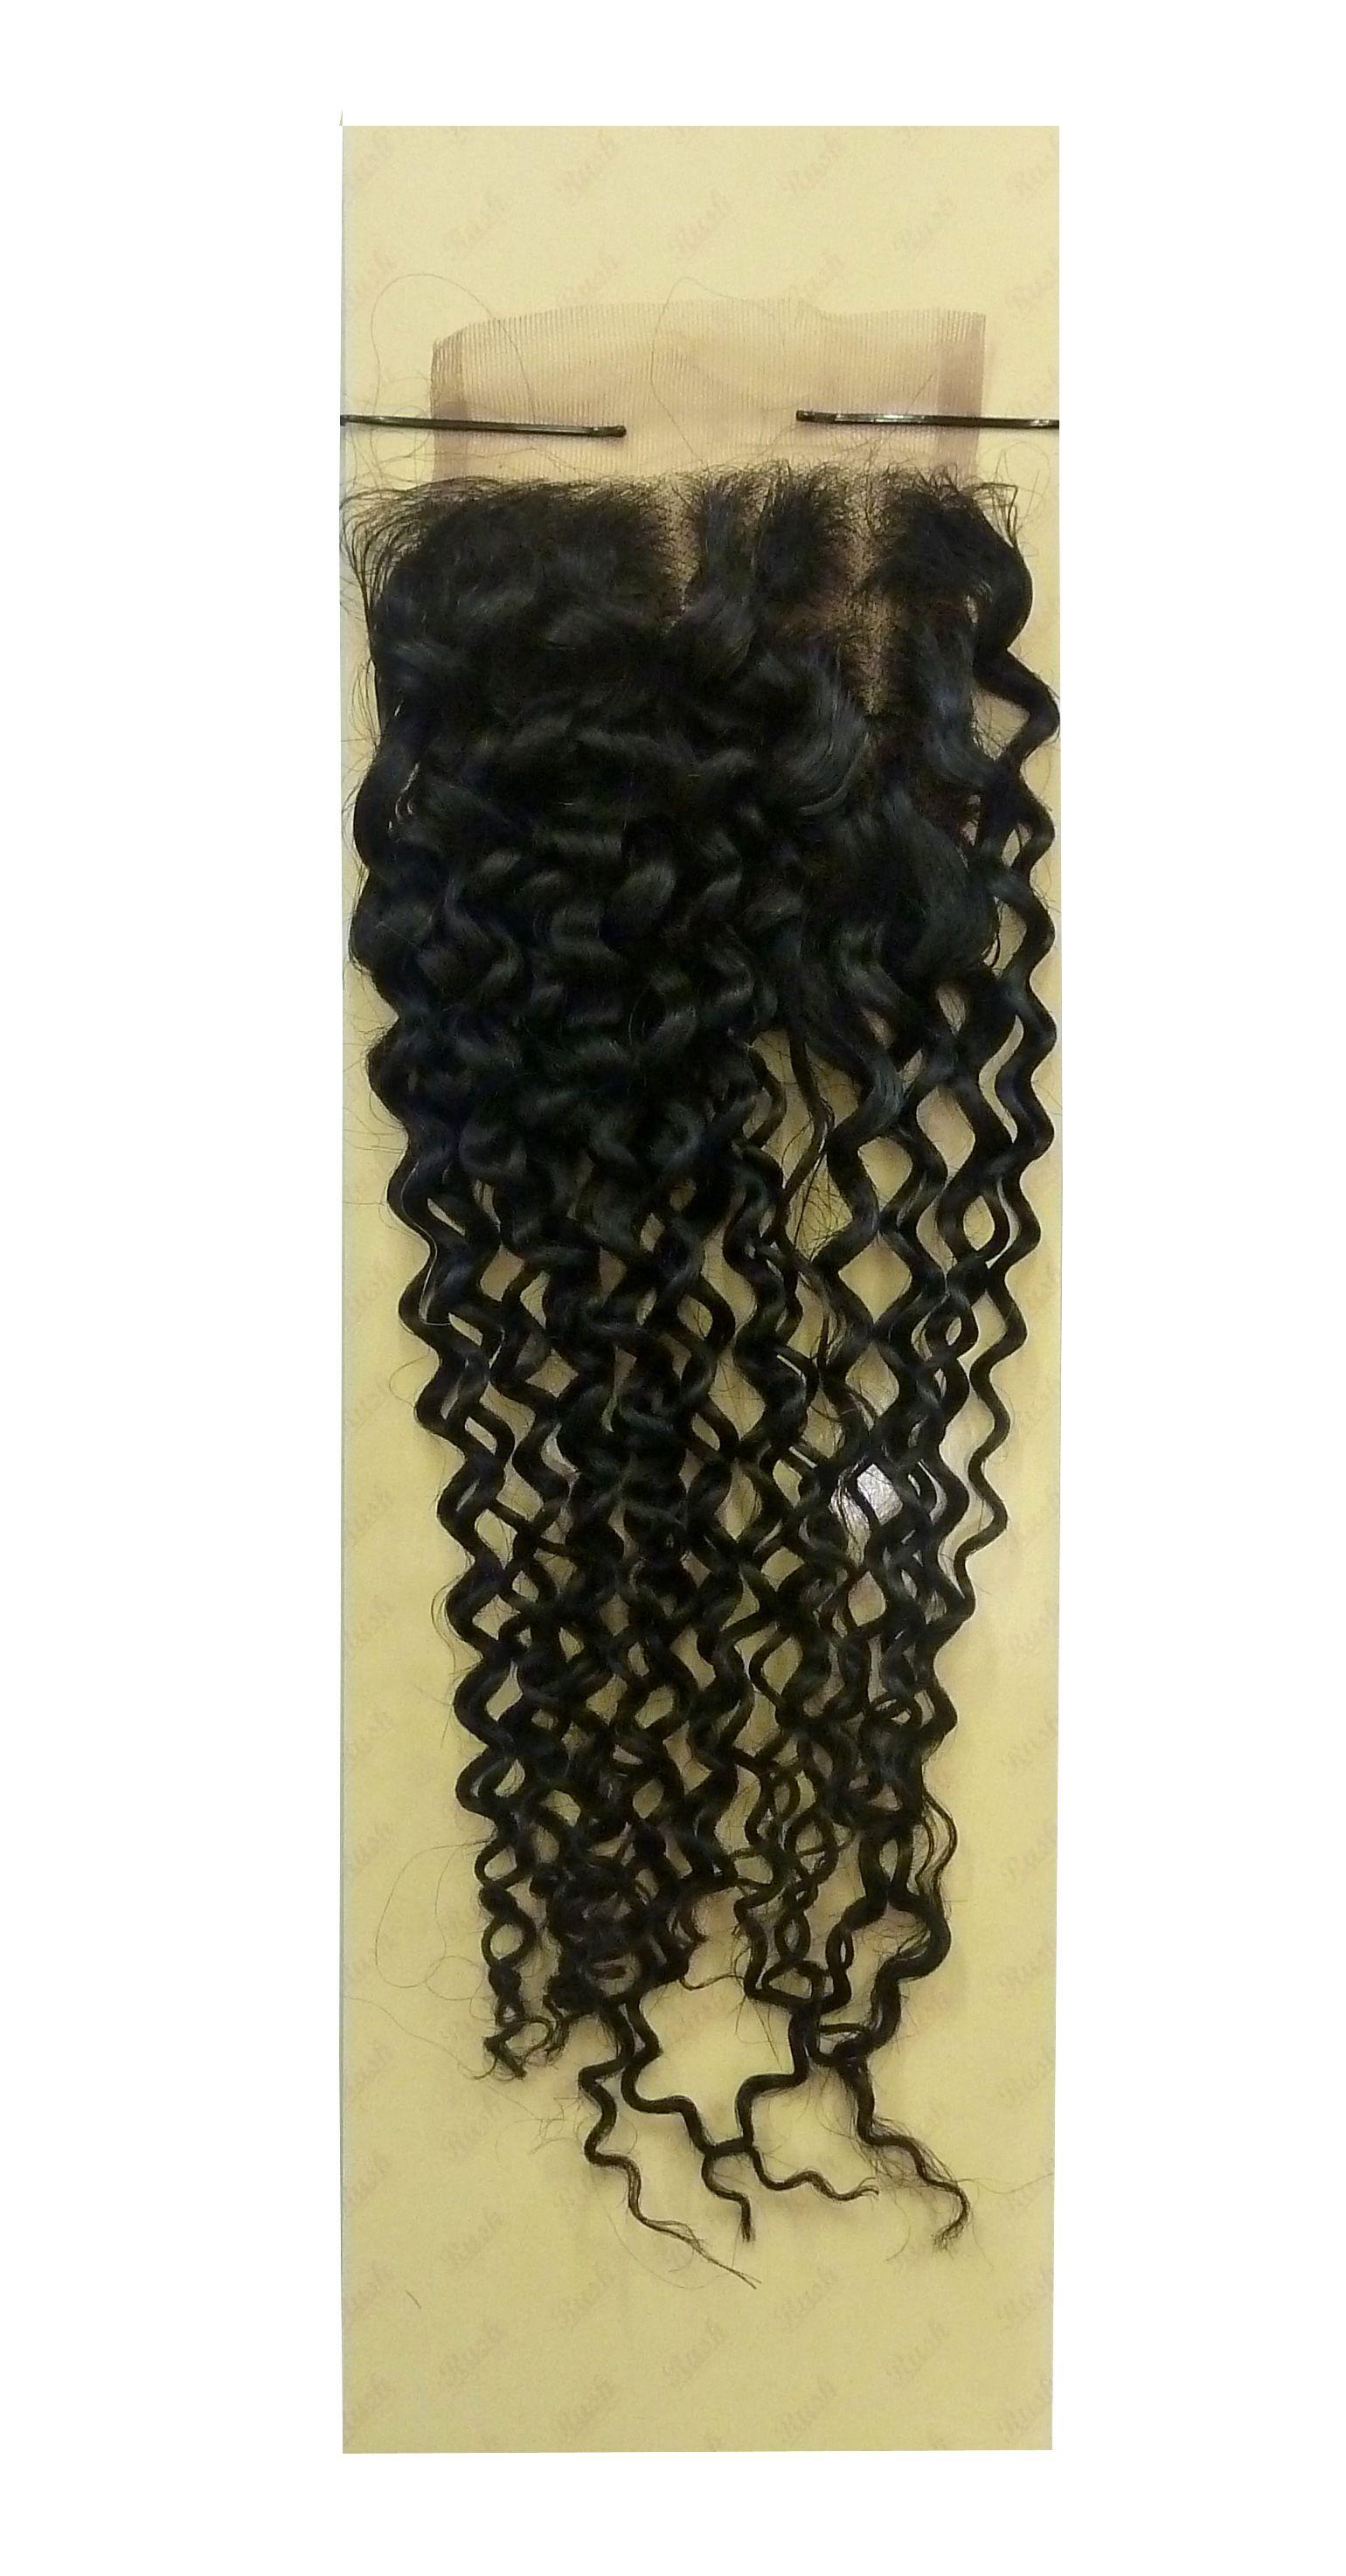 "Rush Brazilian Temptation Closure Jerry Curl Weave 4 X 4 - Natural,12"""